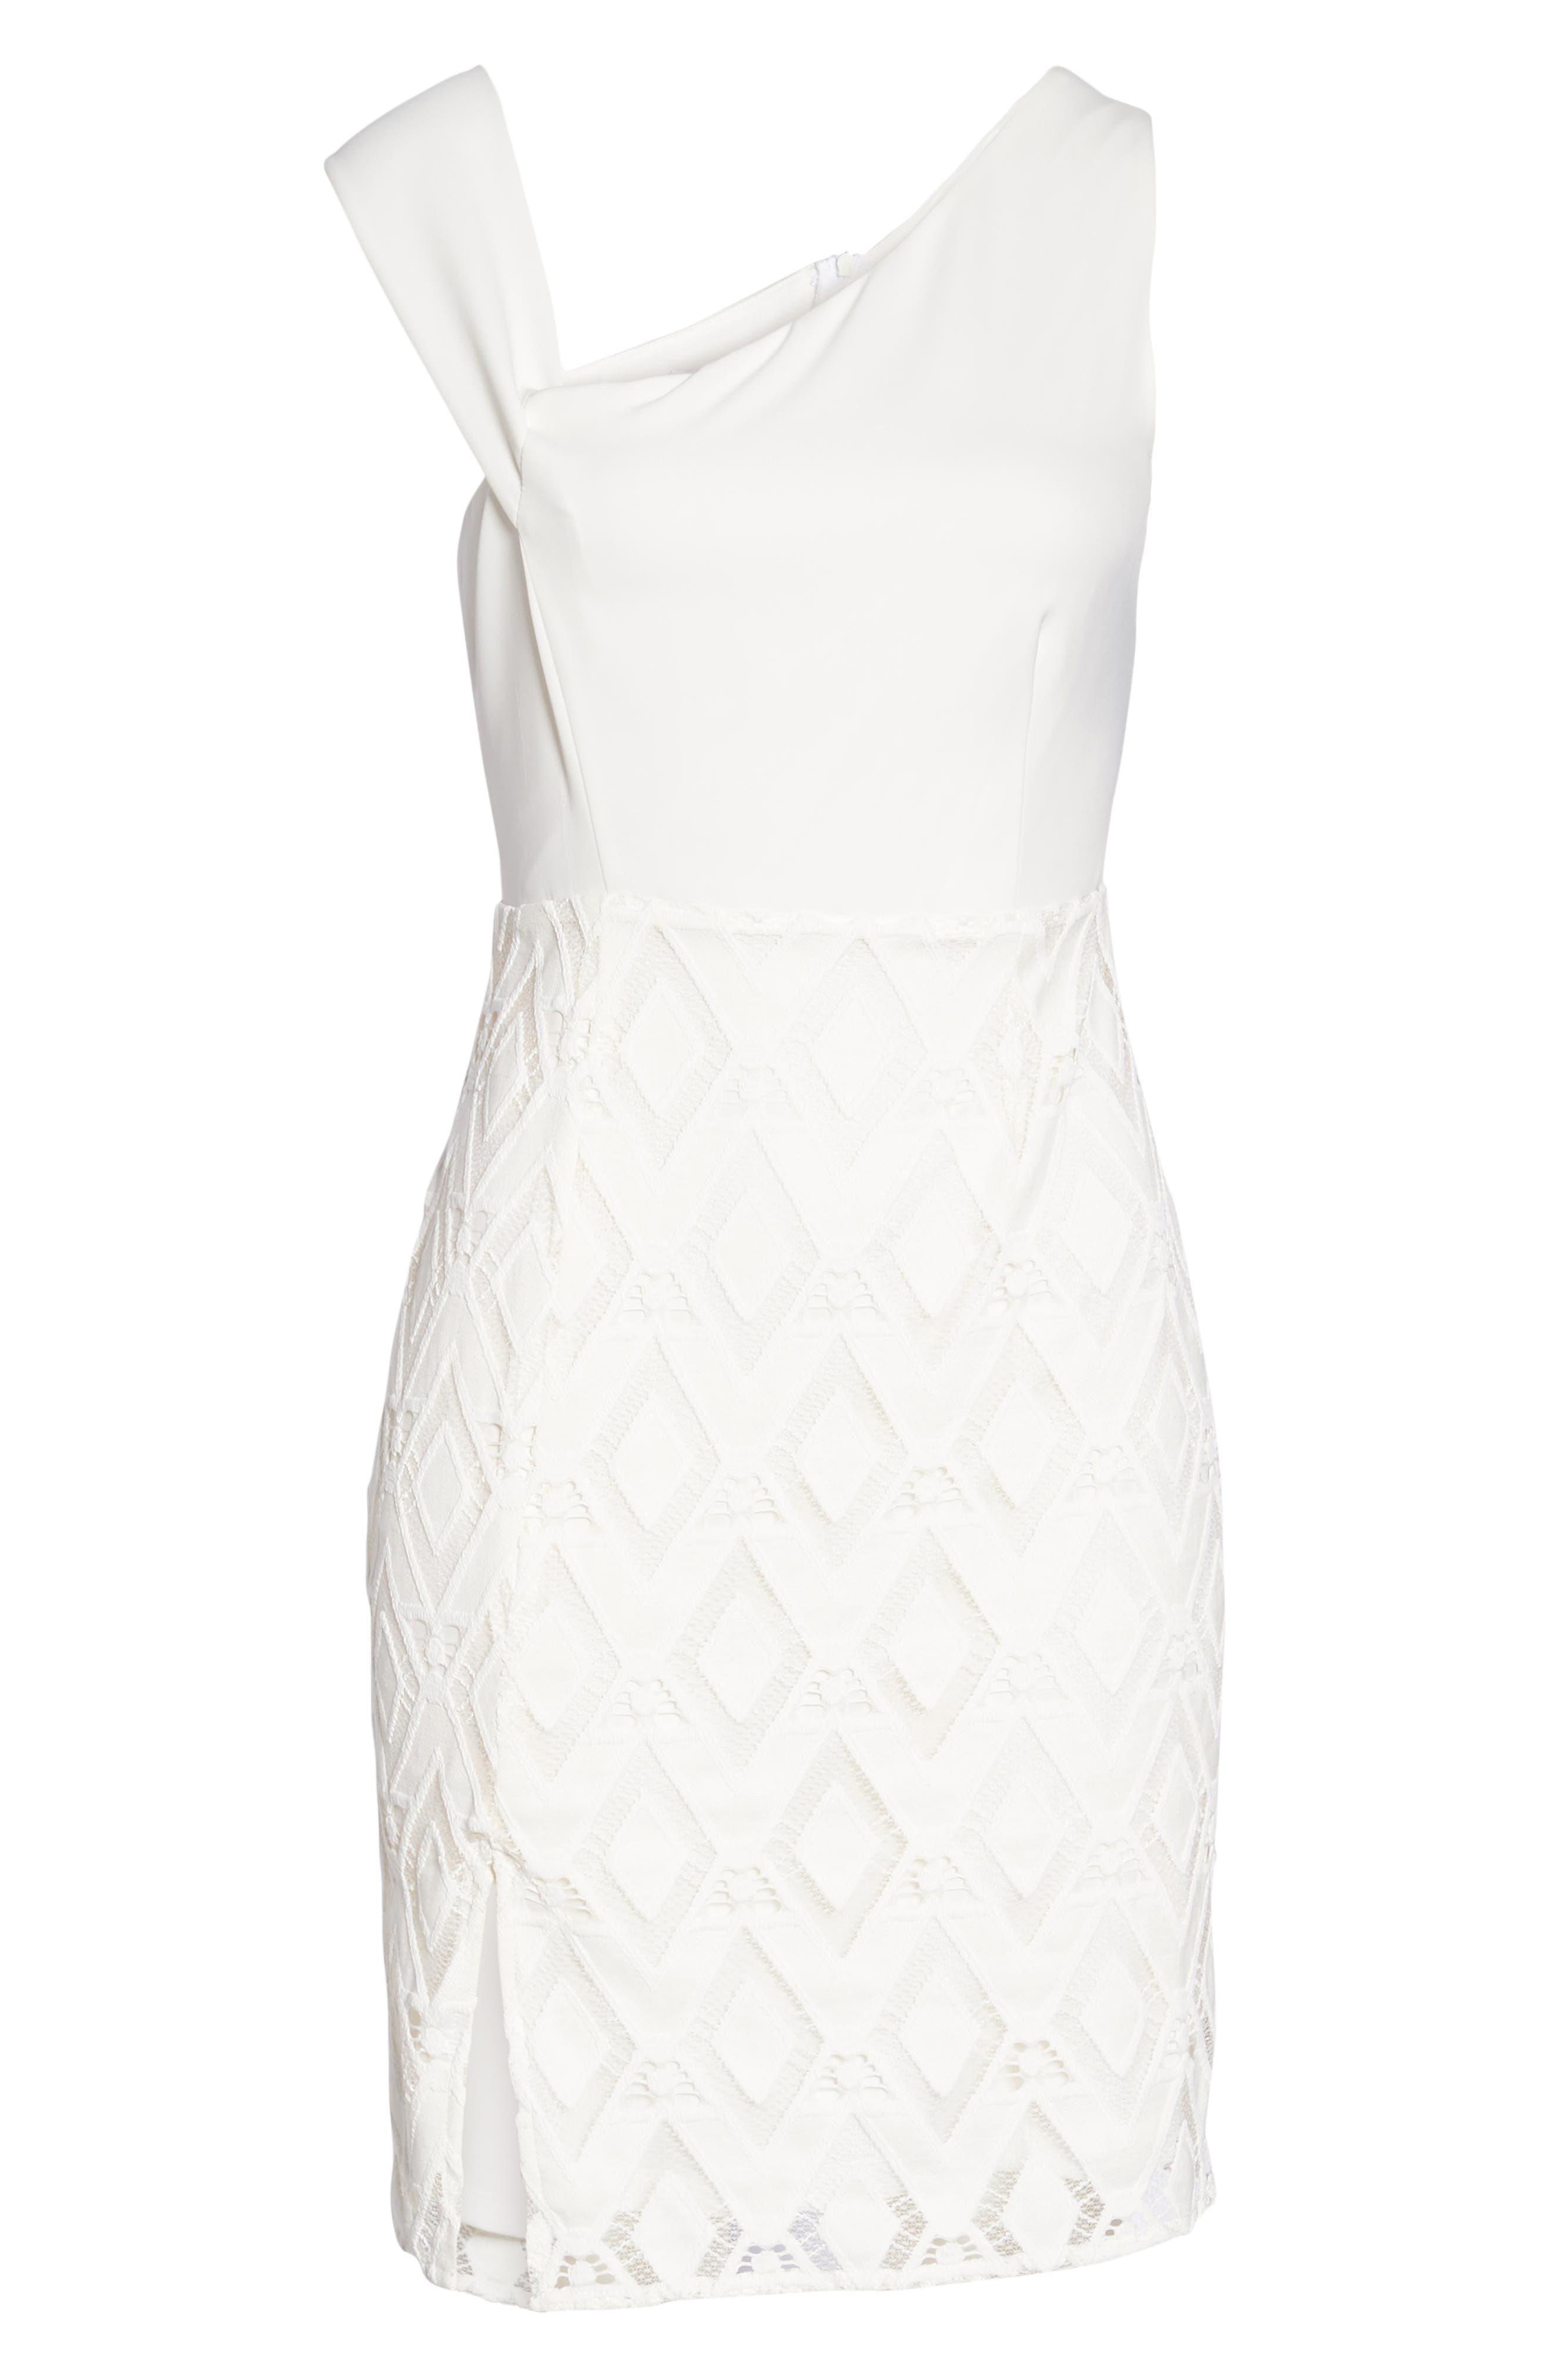 One-Shoulder Lace Sheath Dress,                             Alternate thumbnail 7, color,                             White